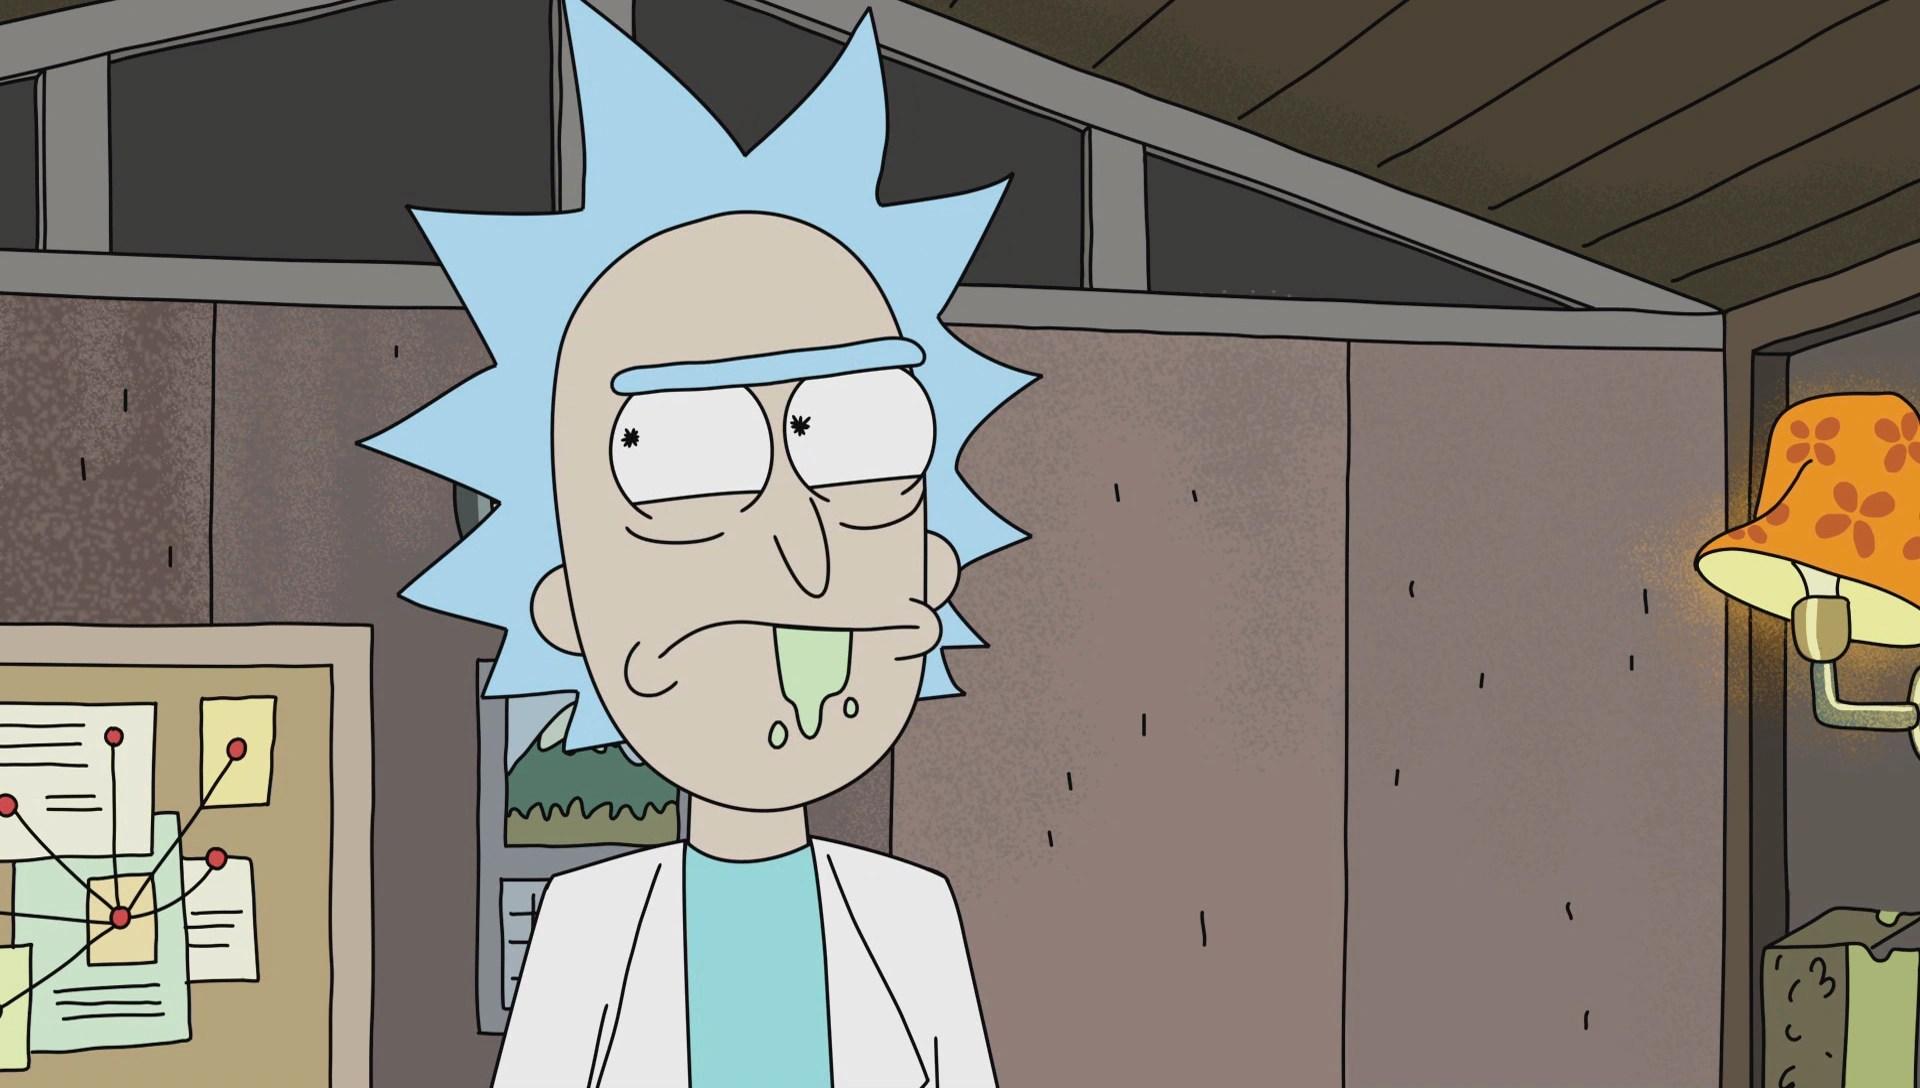 Image - S1e4 rick eyeroll.png | Rick and Morty Wiki | FANDOM powered by Wikia